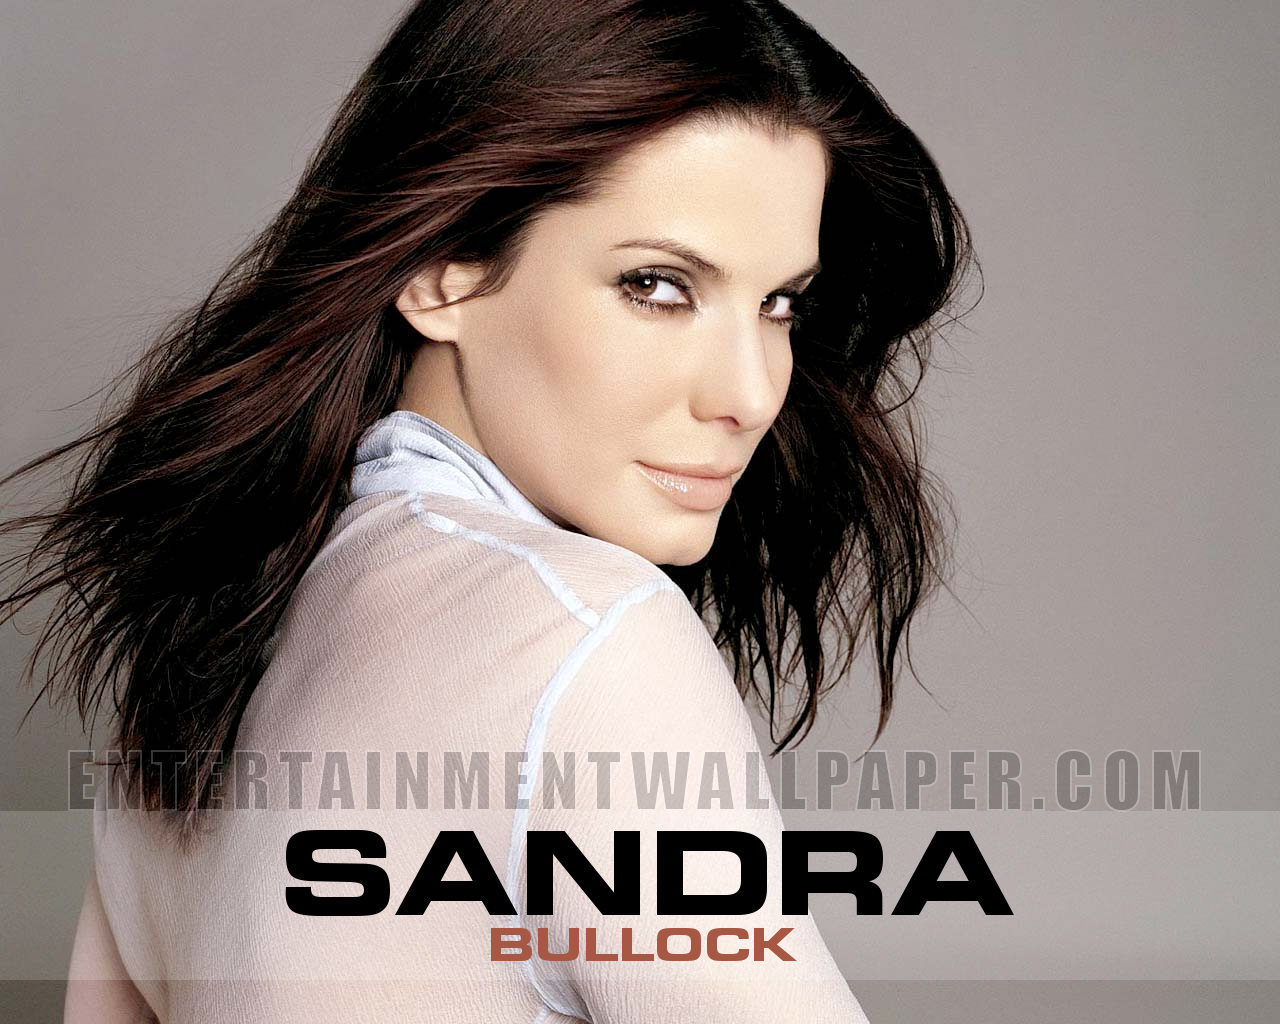 http://3.bp.blogspot.com/-I9G907FAI6Y/T6EOBYrKWaI/AAAAAAAABIM/7uBAv3_NsKc/s1600/Sandra%2BBullock%2Bwallpapers%2B10.jpg